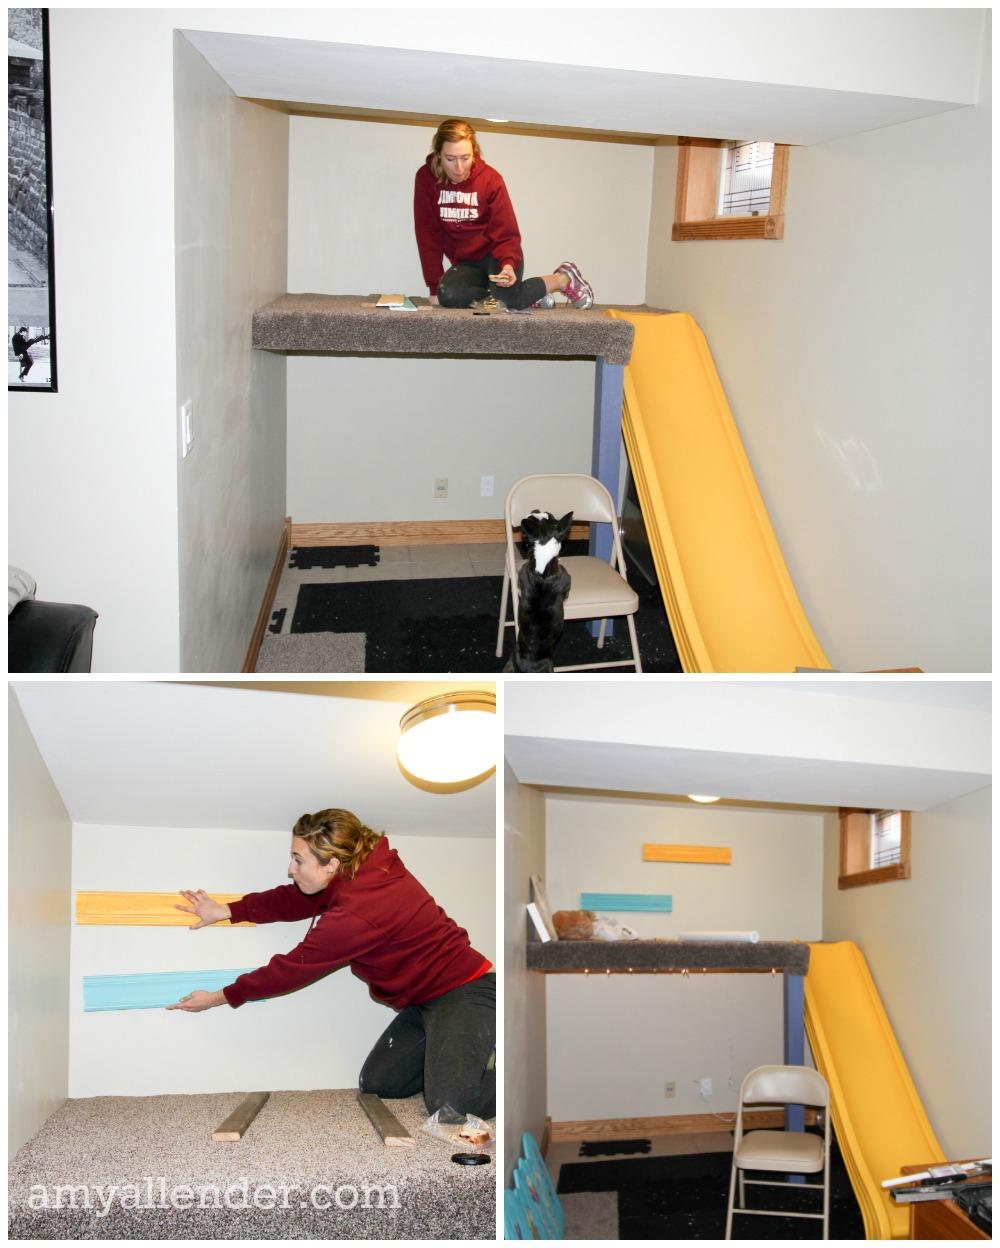 Diy Playroom Loft Amy Allender